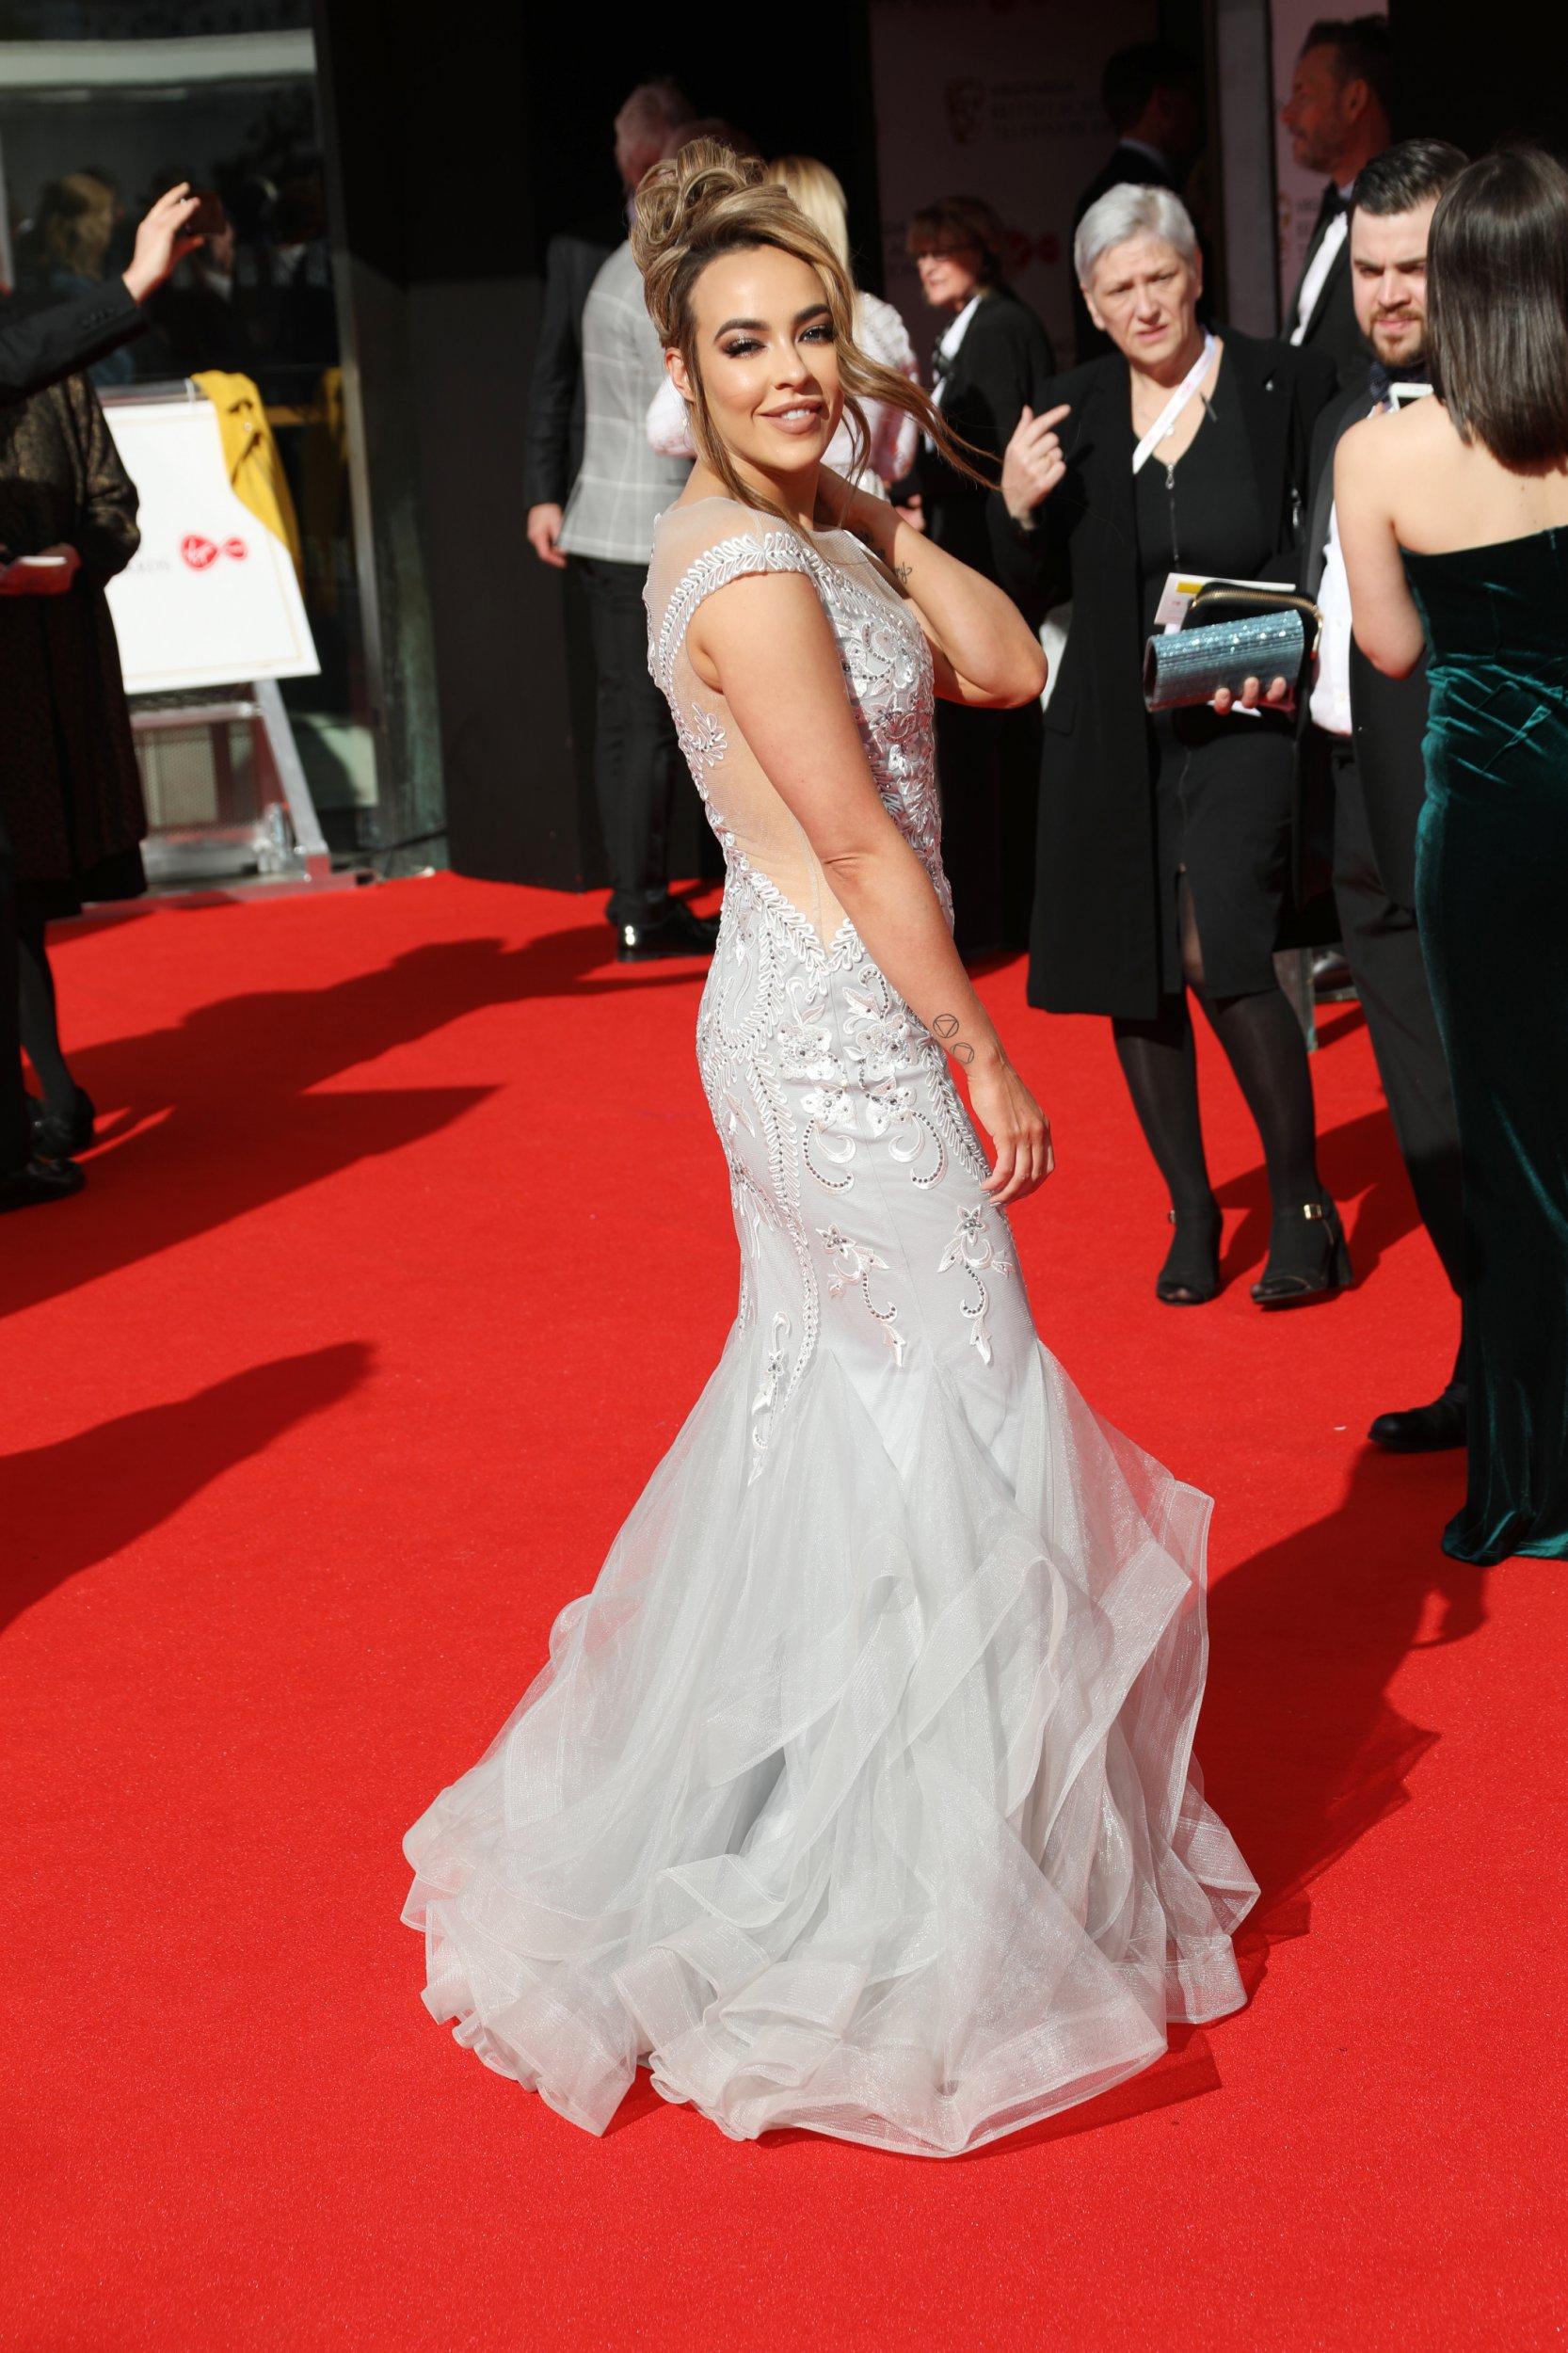 Hollyoaks star Stephanie Davis reveals plans to marry boyfriend Owen Warner